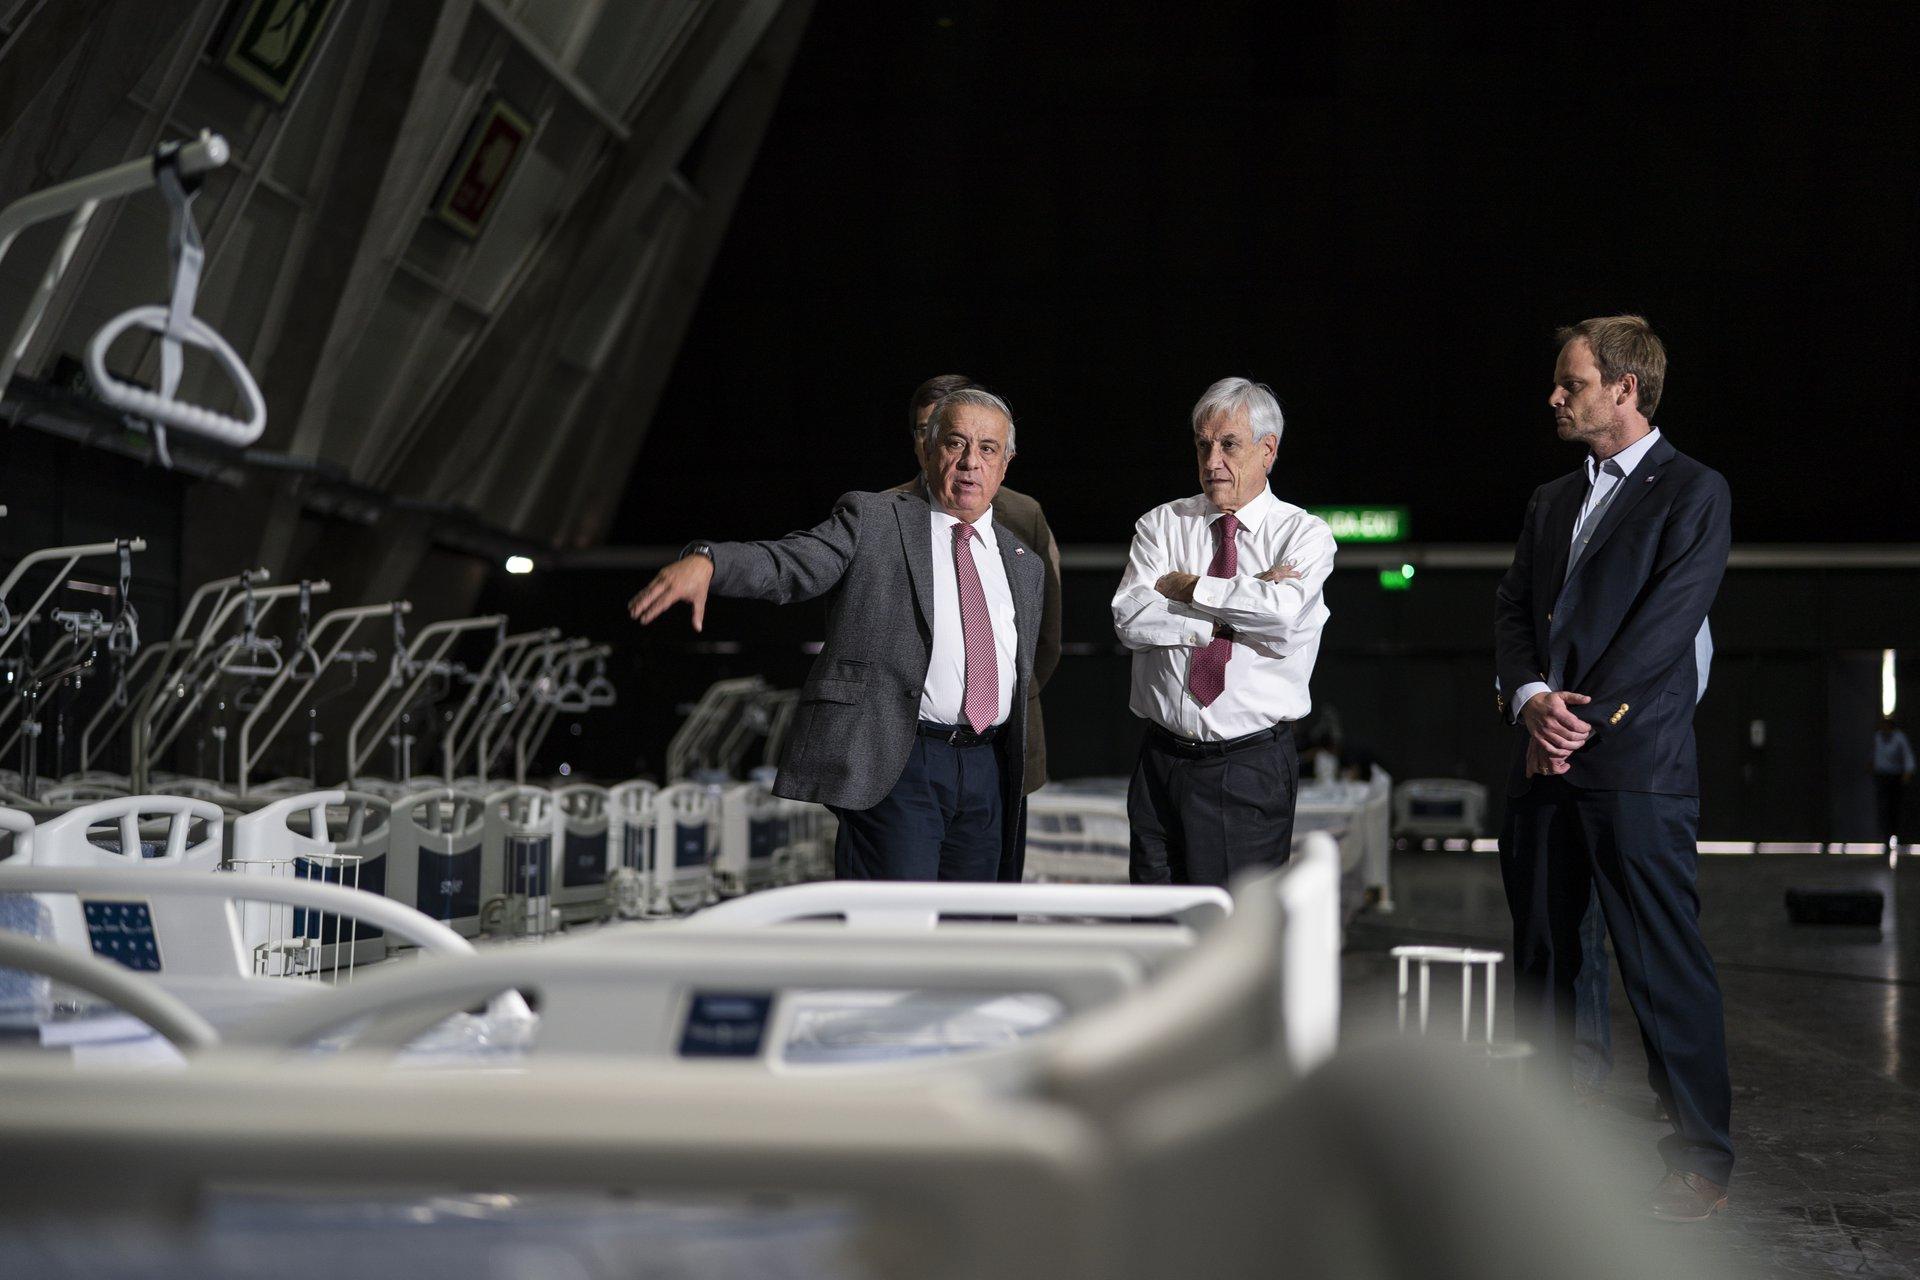 Presidente Piñera en inspección en hospital de Chile